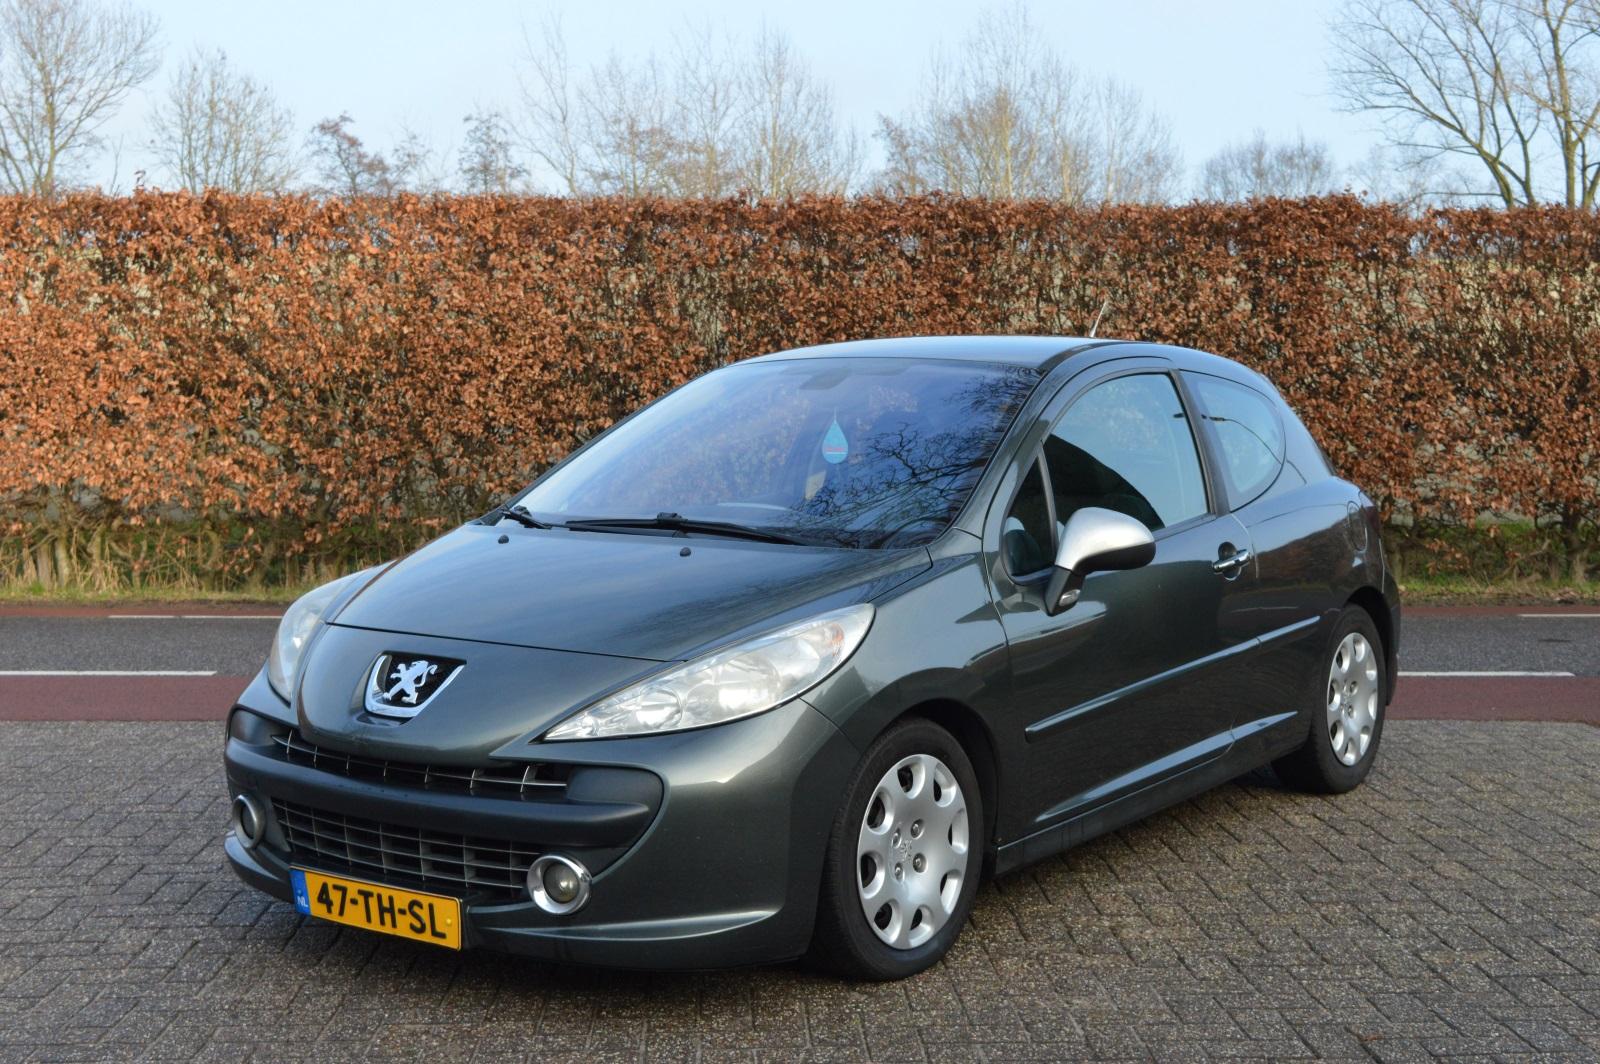 Peugeot 207 1.6 HDi 110CV 3p. XS Usate LENO - Annunci ...